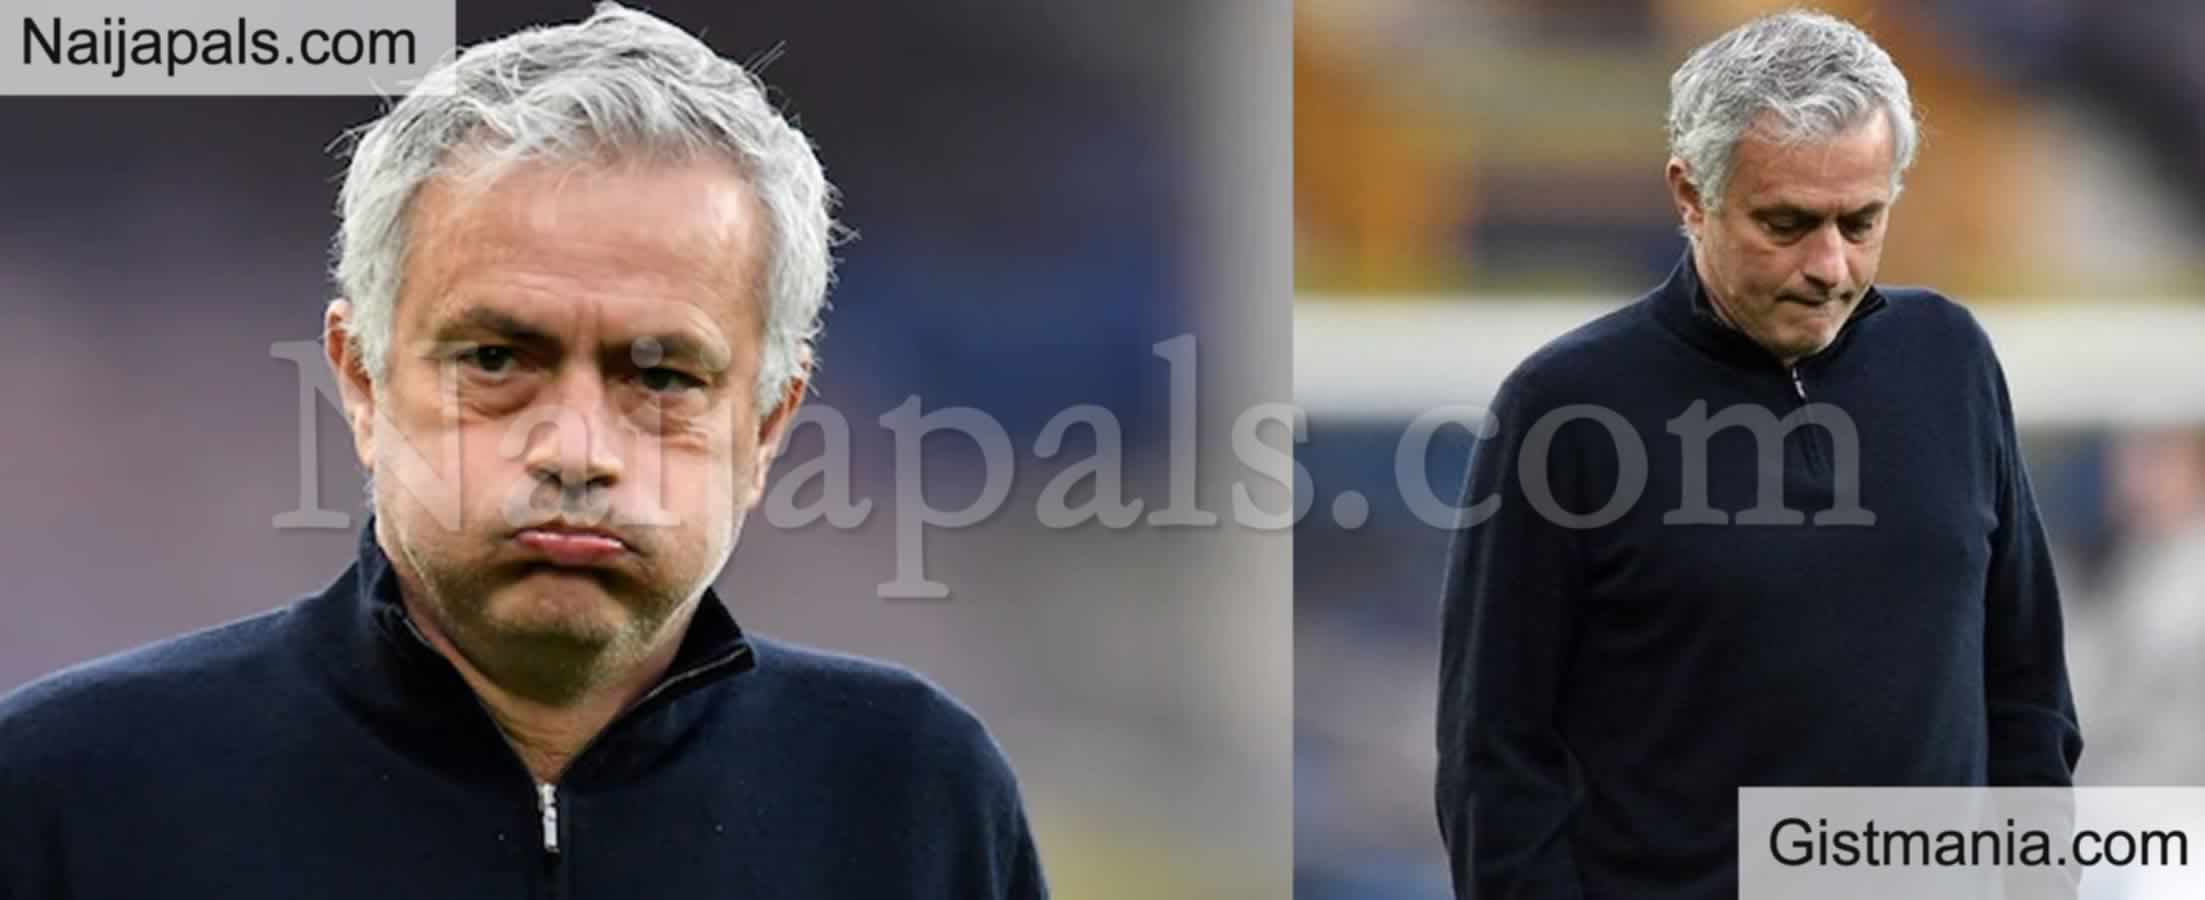 <img alt='.' class='lazyload' data-src='https://img.gistmania.com/emot/soccer.gif' /> Just In: <b>Jose Mourinho Fired As Tottenham Coach, Assistant Coach Ryan Mason To Assume Duties</b>